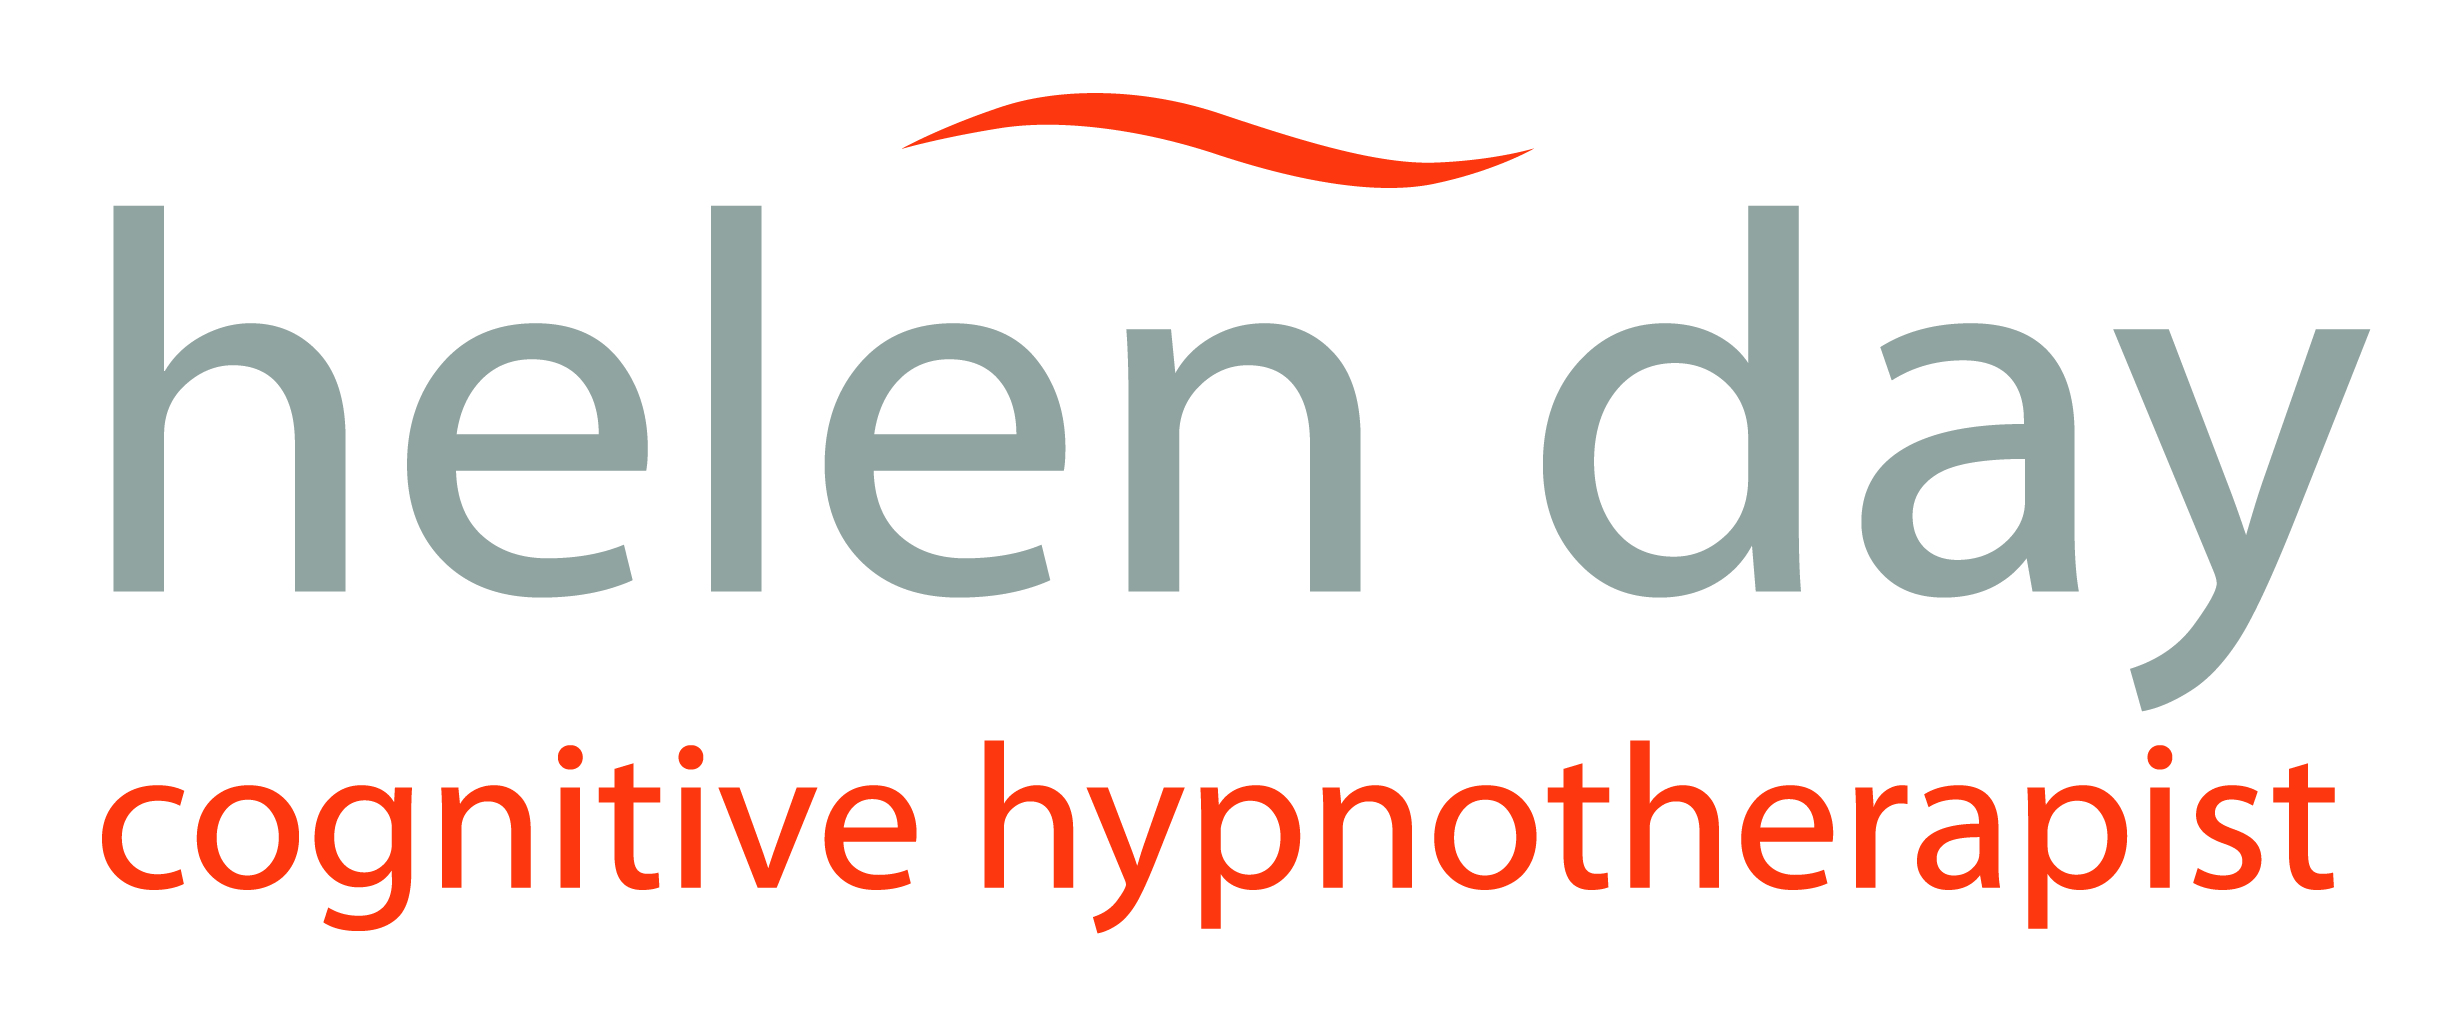 Helen Day – Flyers and Digital Publication | 1348design.com